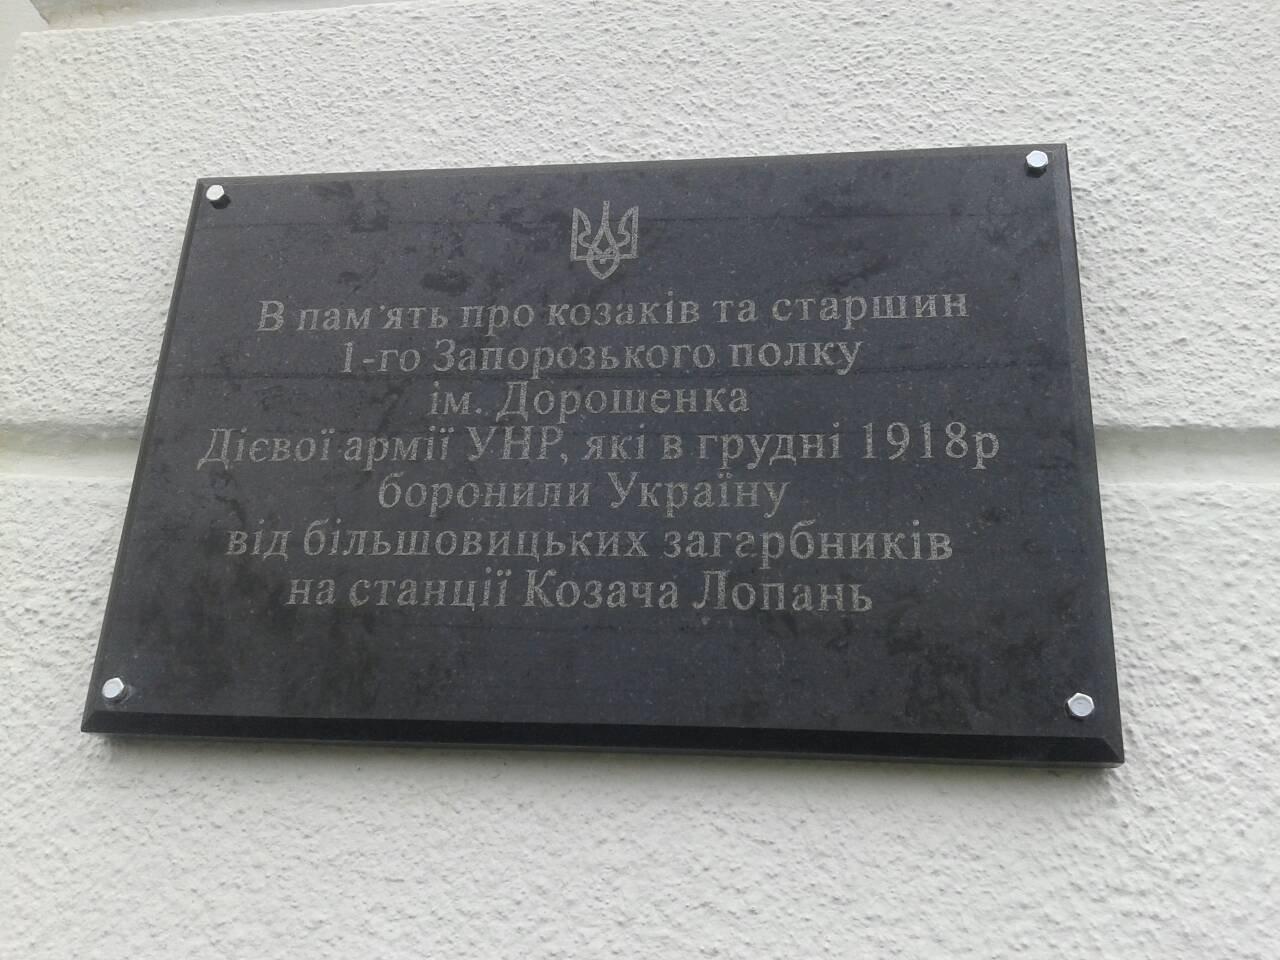 Меморіальна дошка на честь українських вояків на ст. Козача Лопань